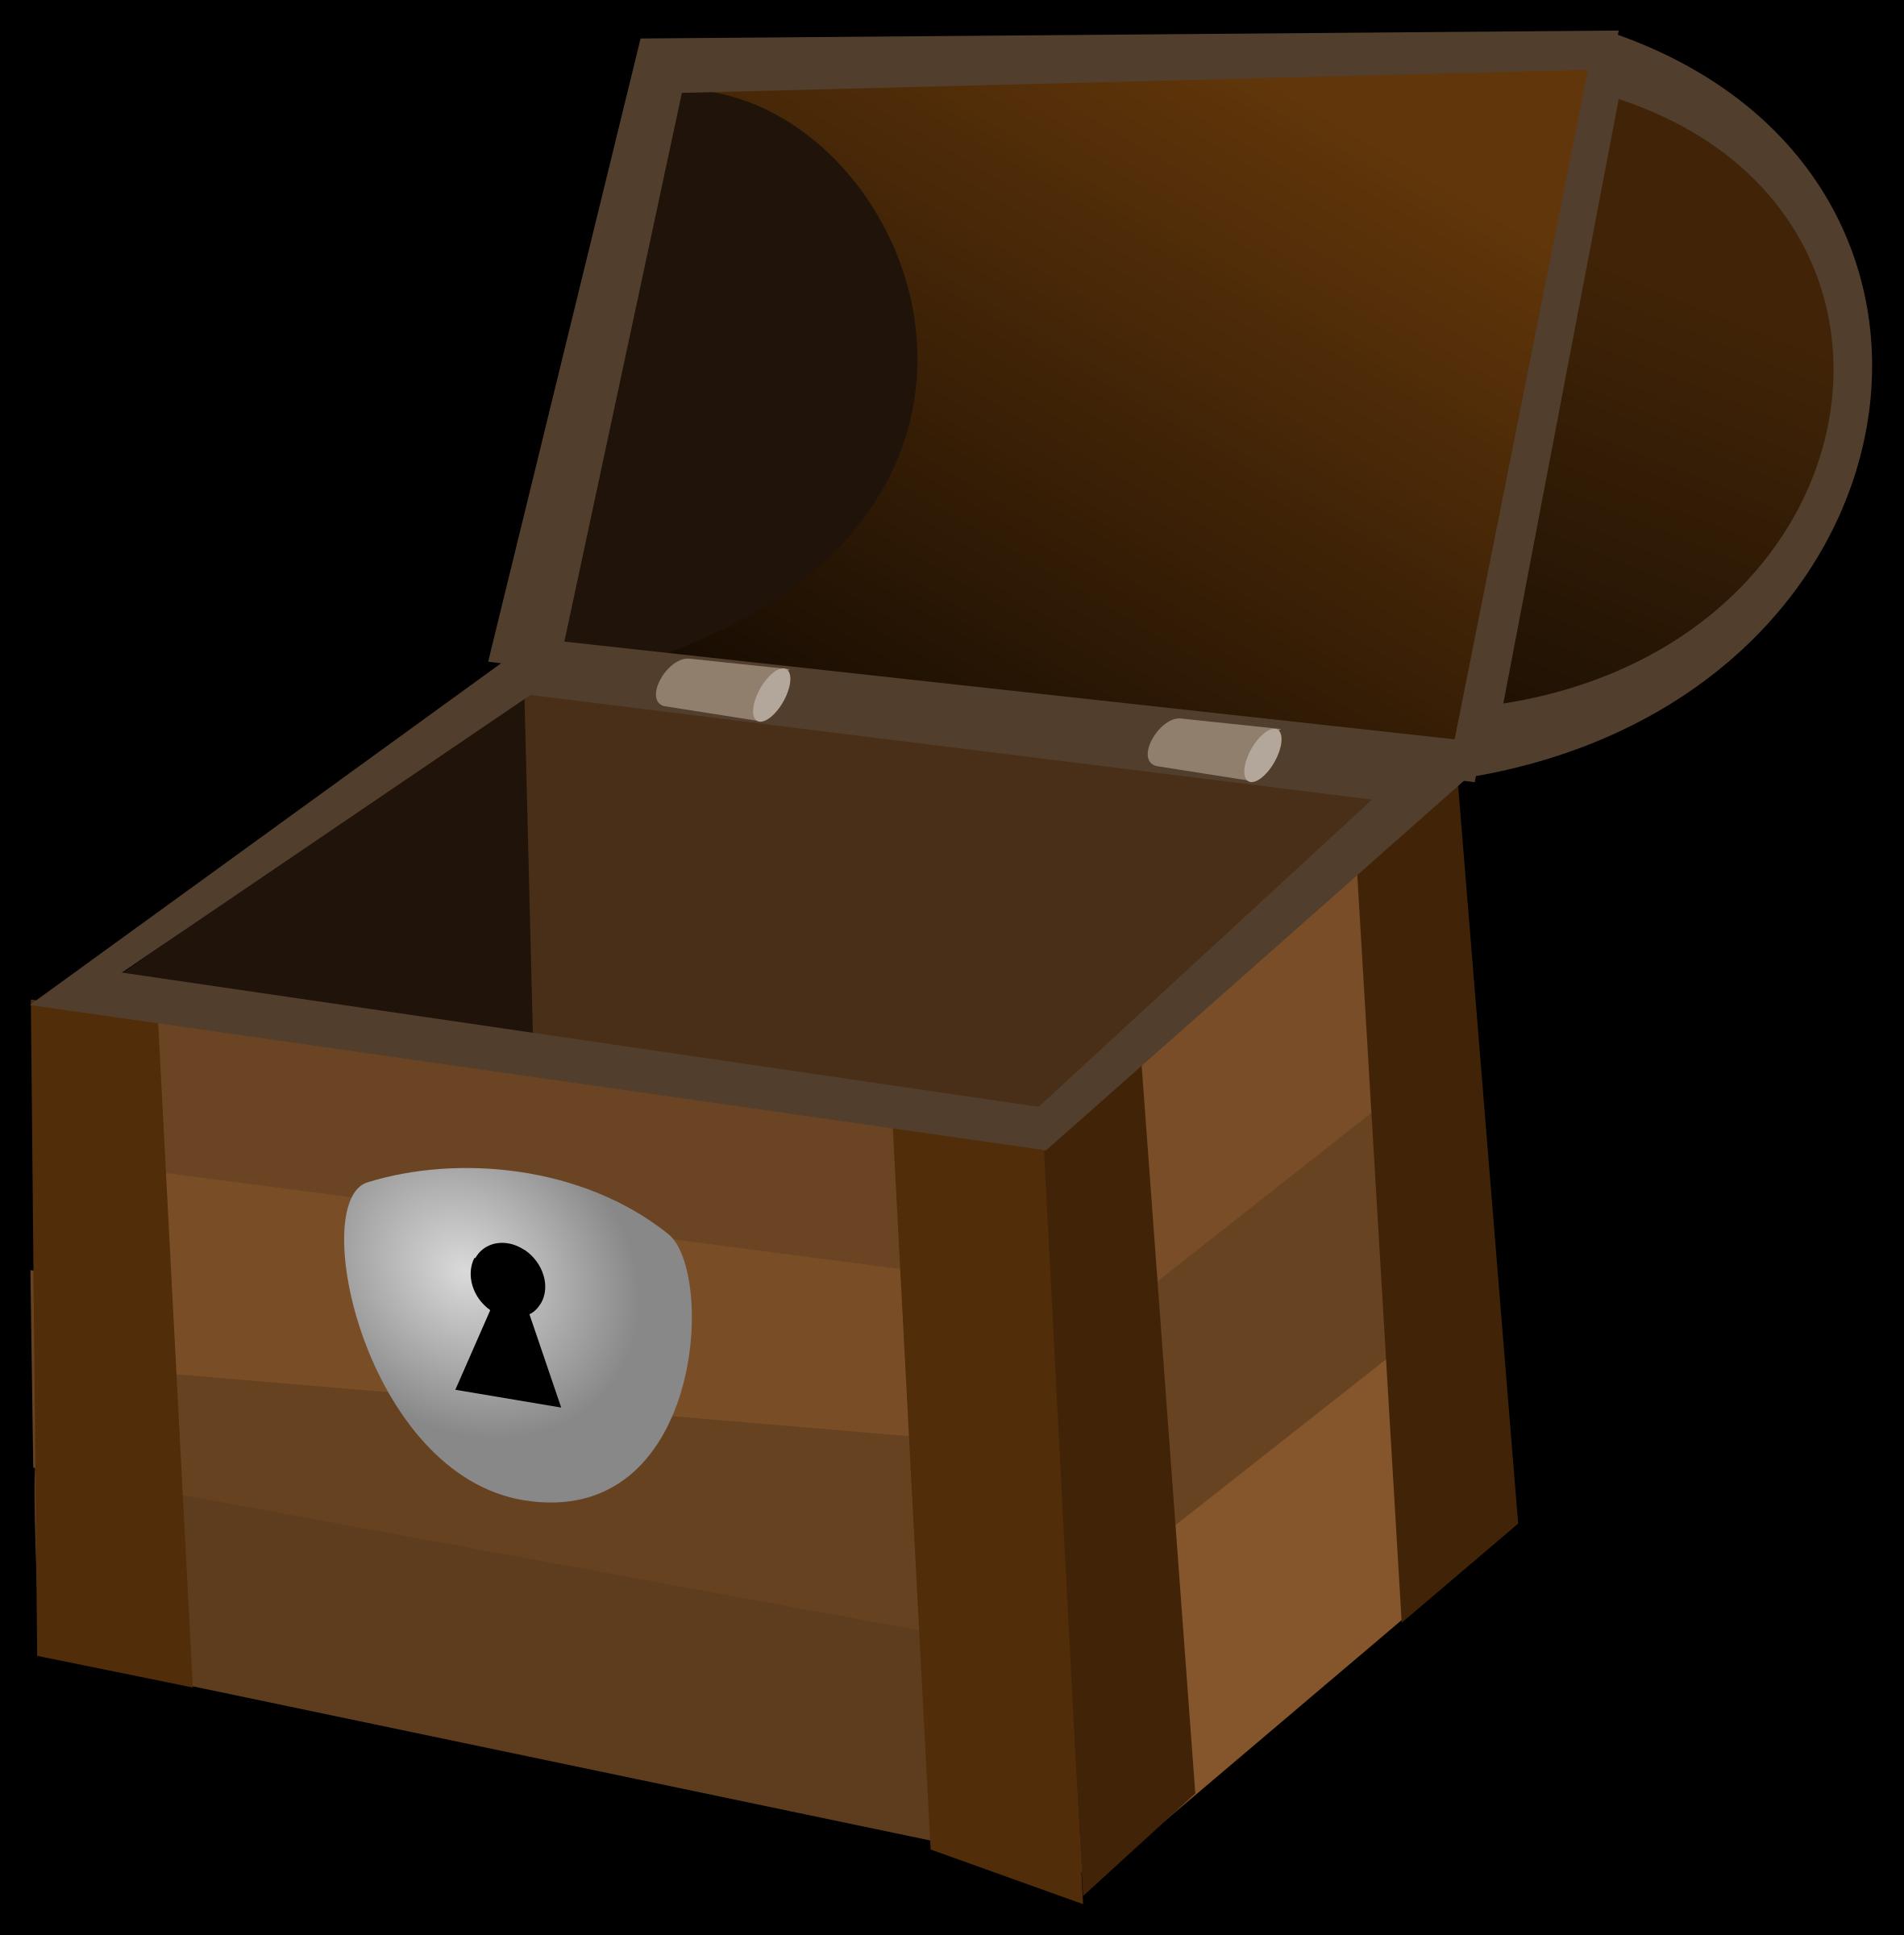 Treasure clipart baul. Chests big image png